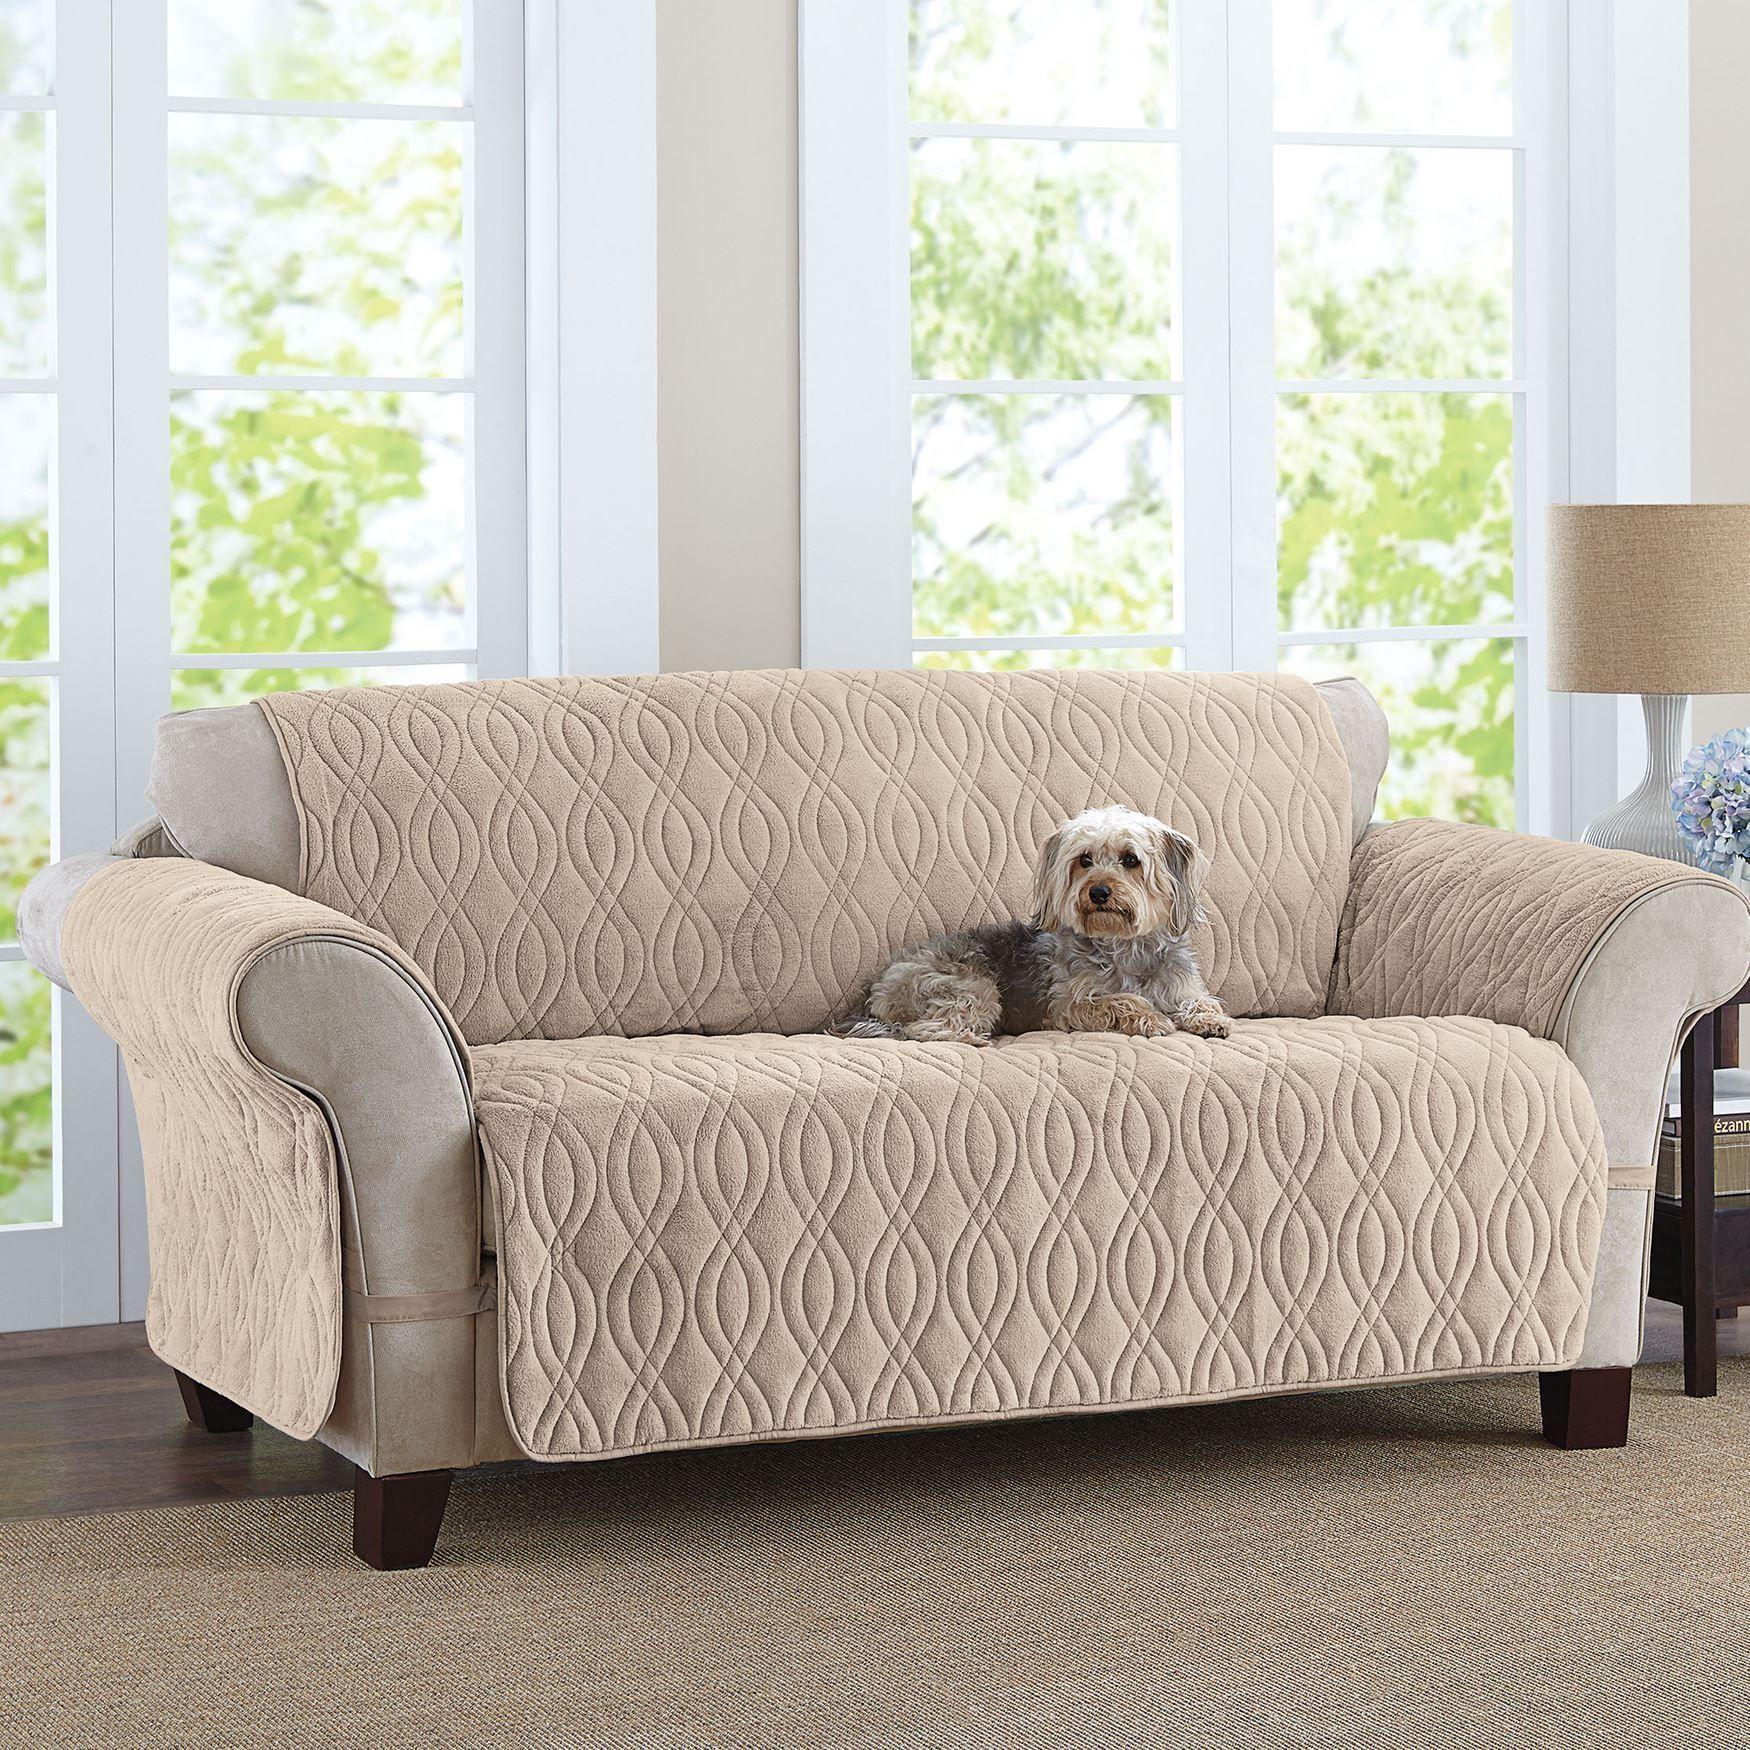 Plush Pet Covers  Meeewow  Forros para sofas Fundas para sillas Funda sillas comedor